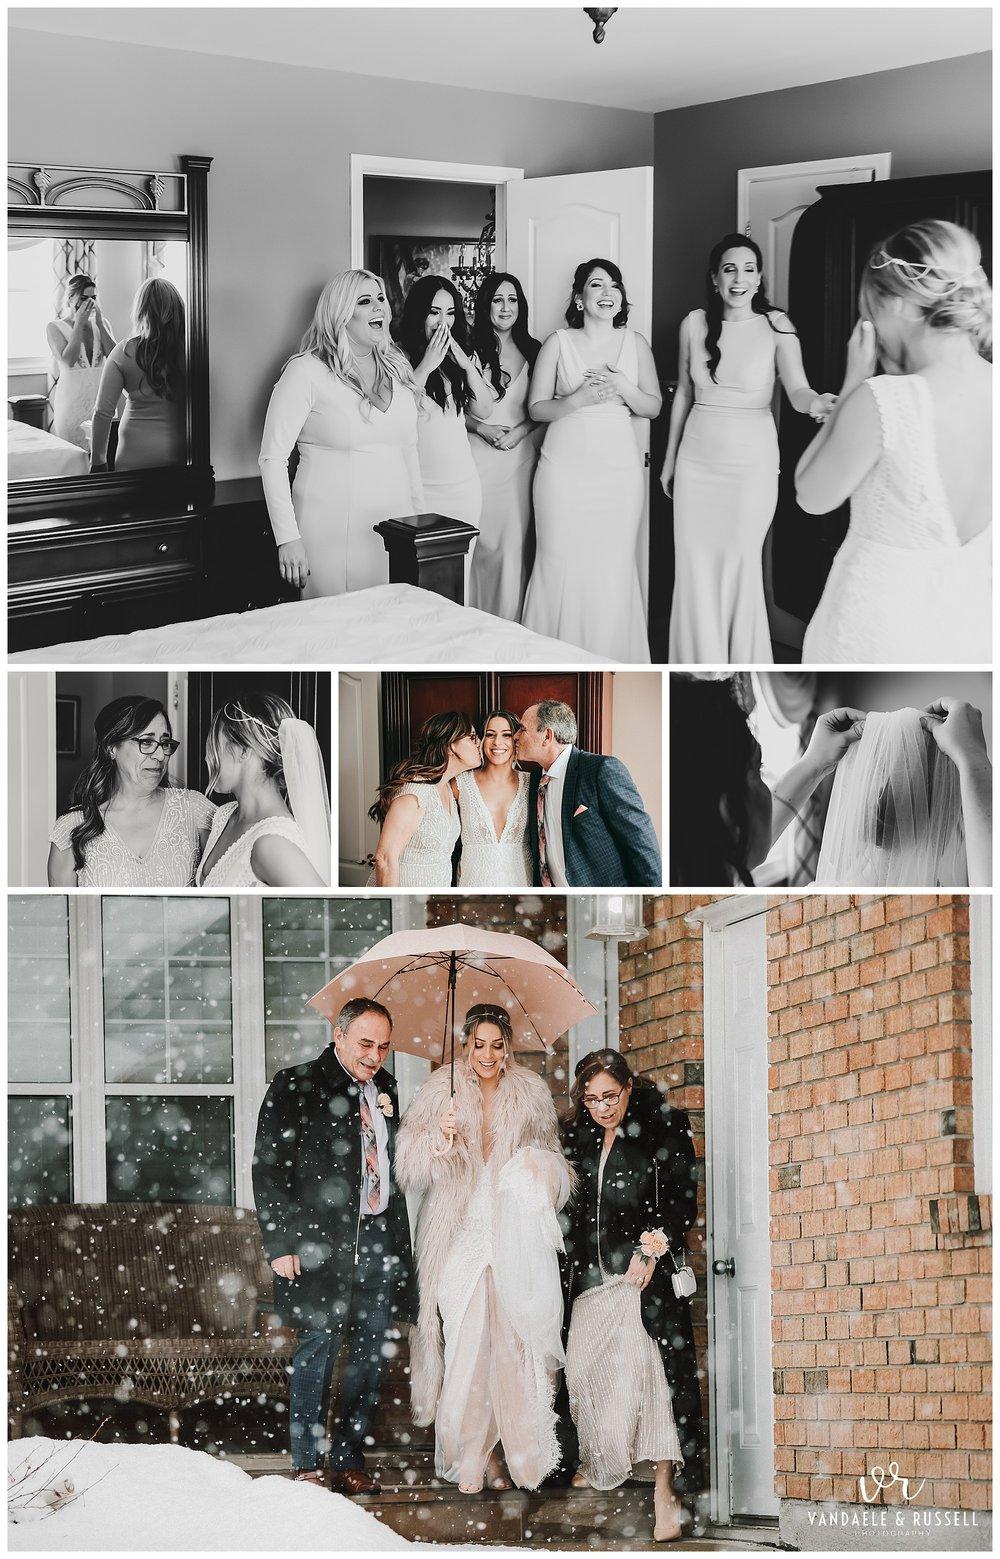 Joanna-Christos-Grand-Luxe-Wedding-Photos-Mint-Room-Toronto-VanDaele-Russell_0065.jpg